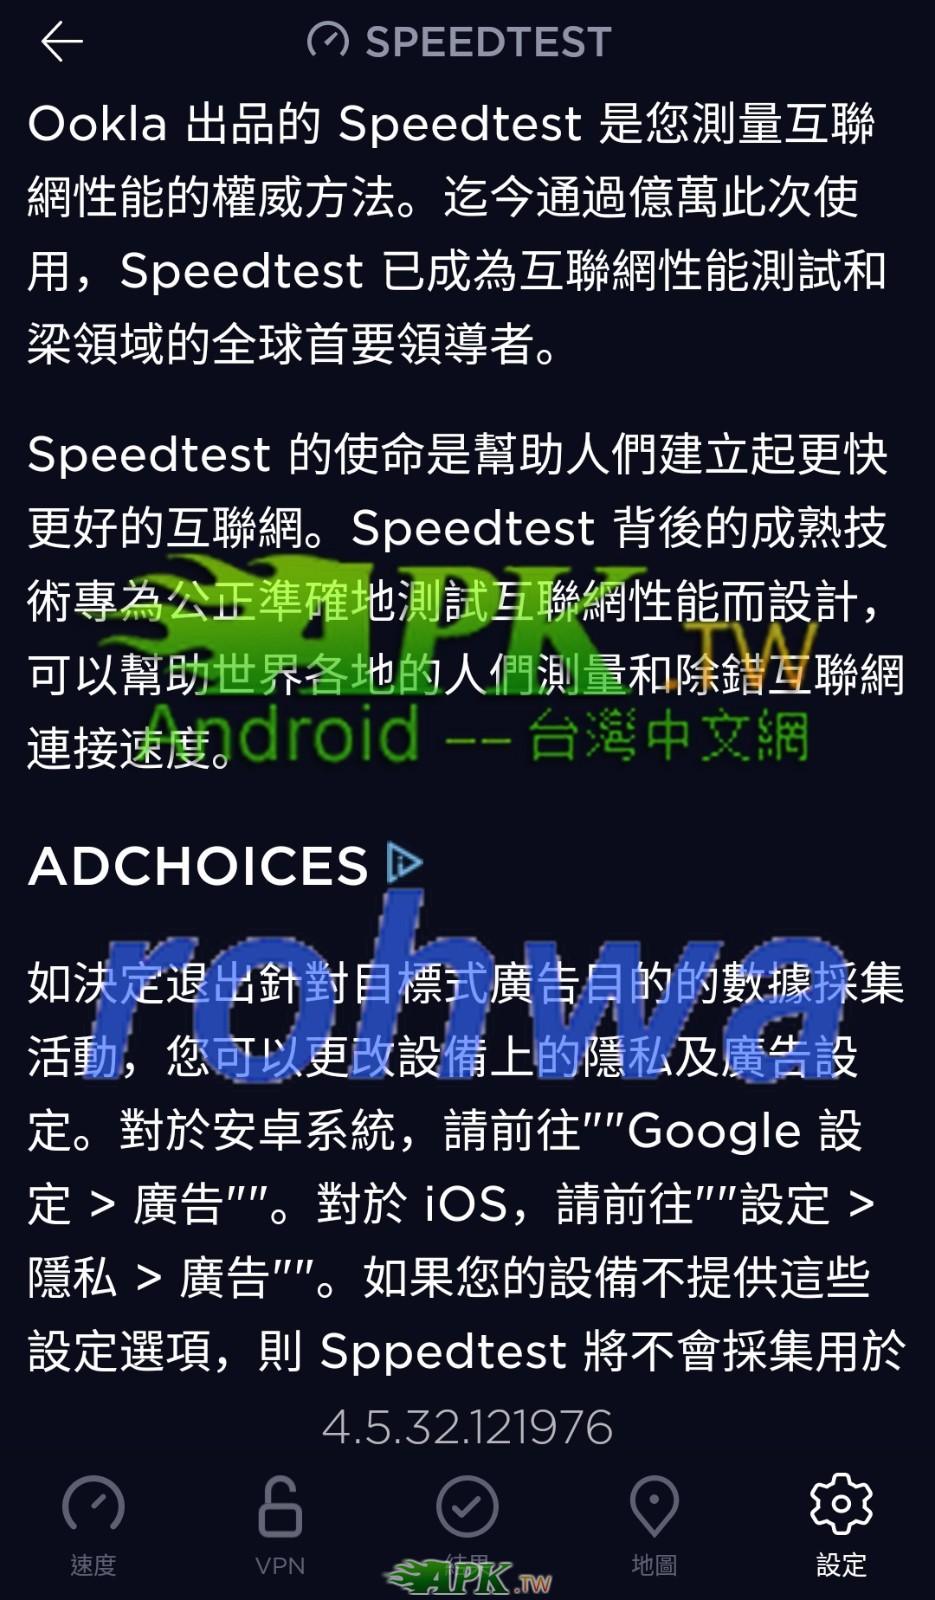 Speedtest__3__.jpg